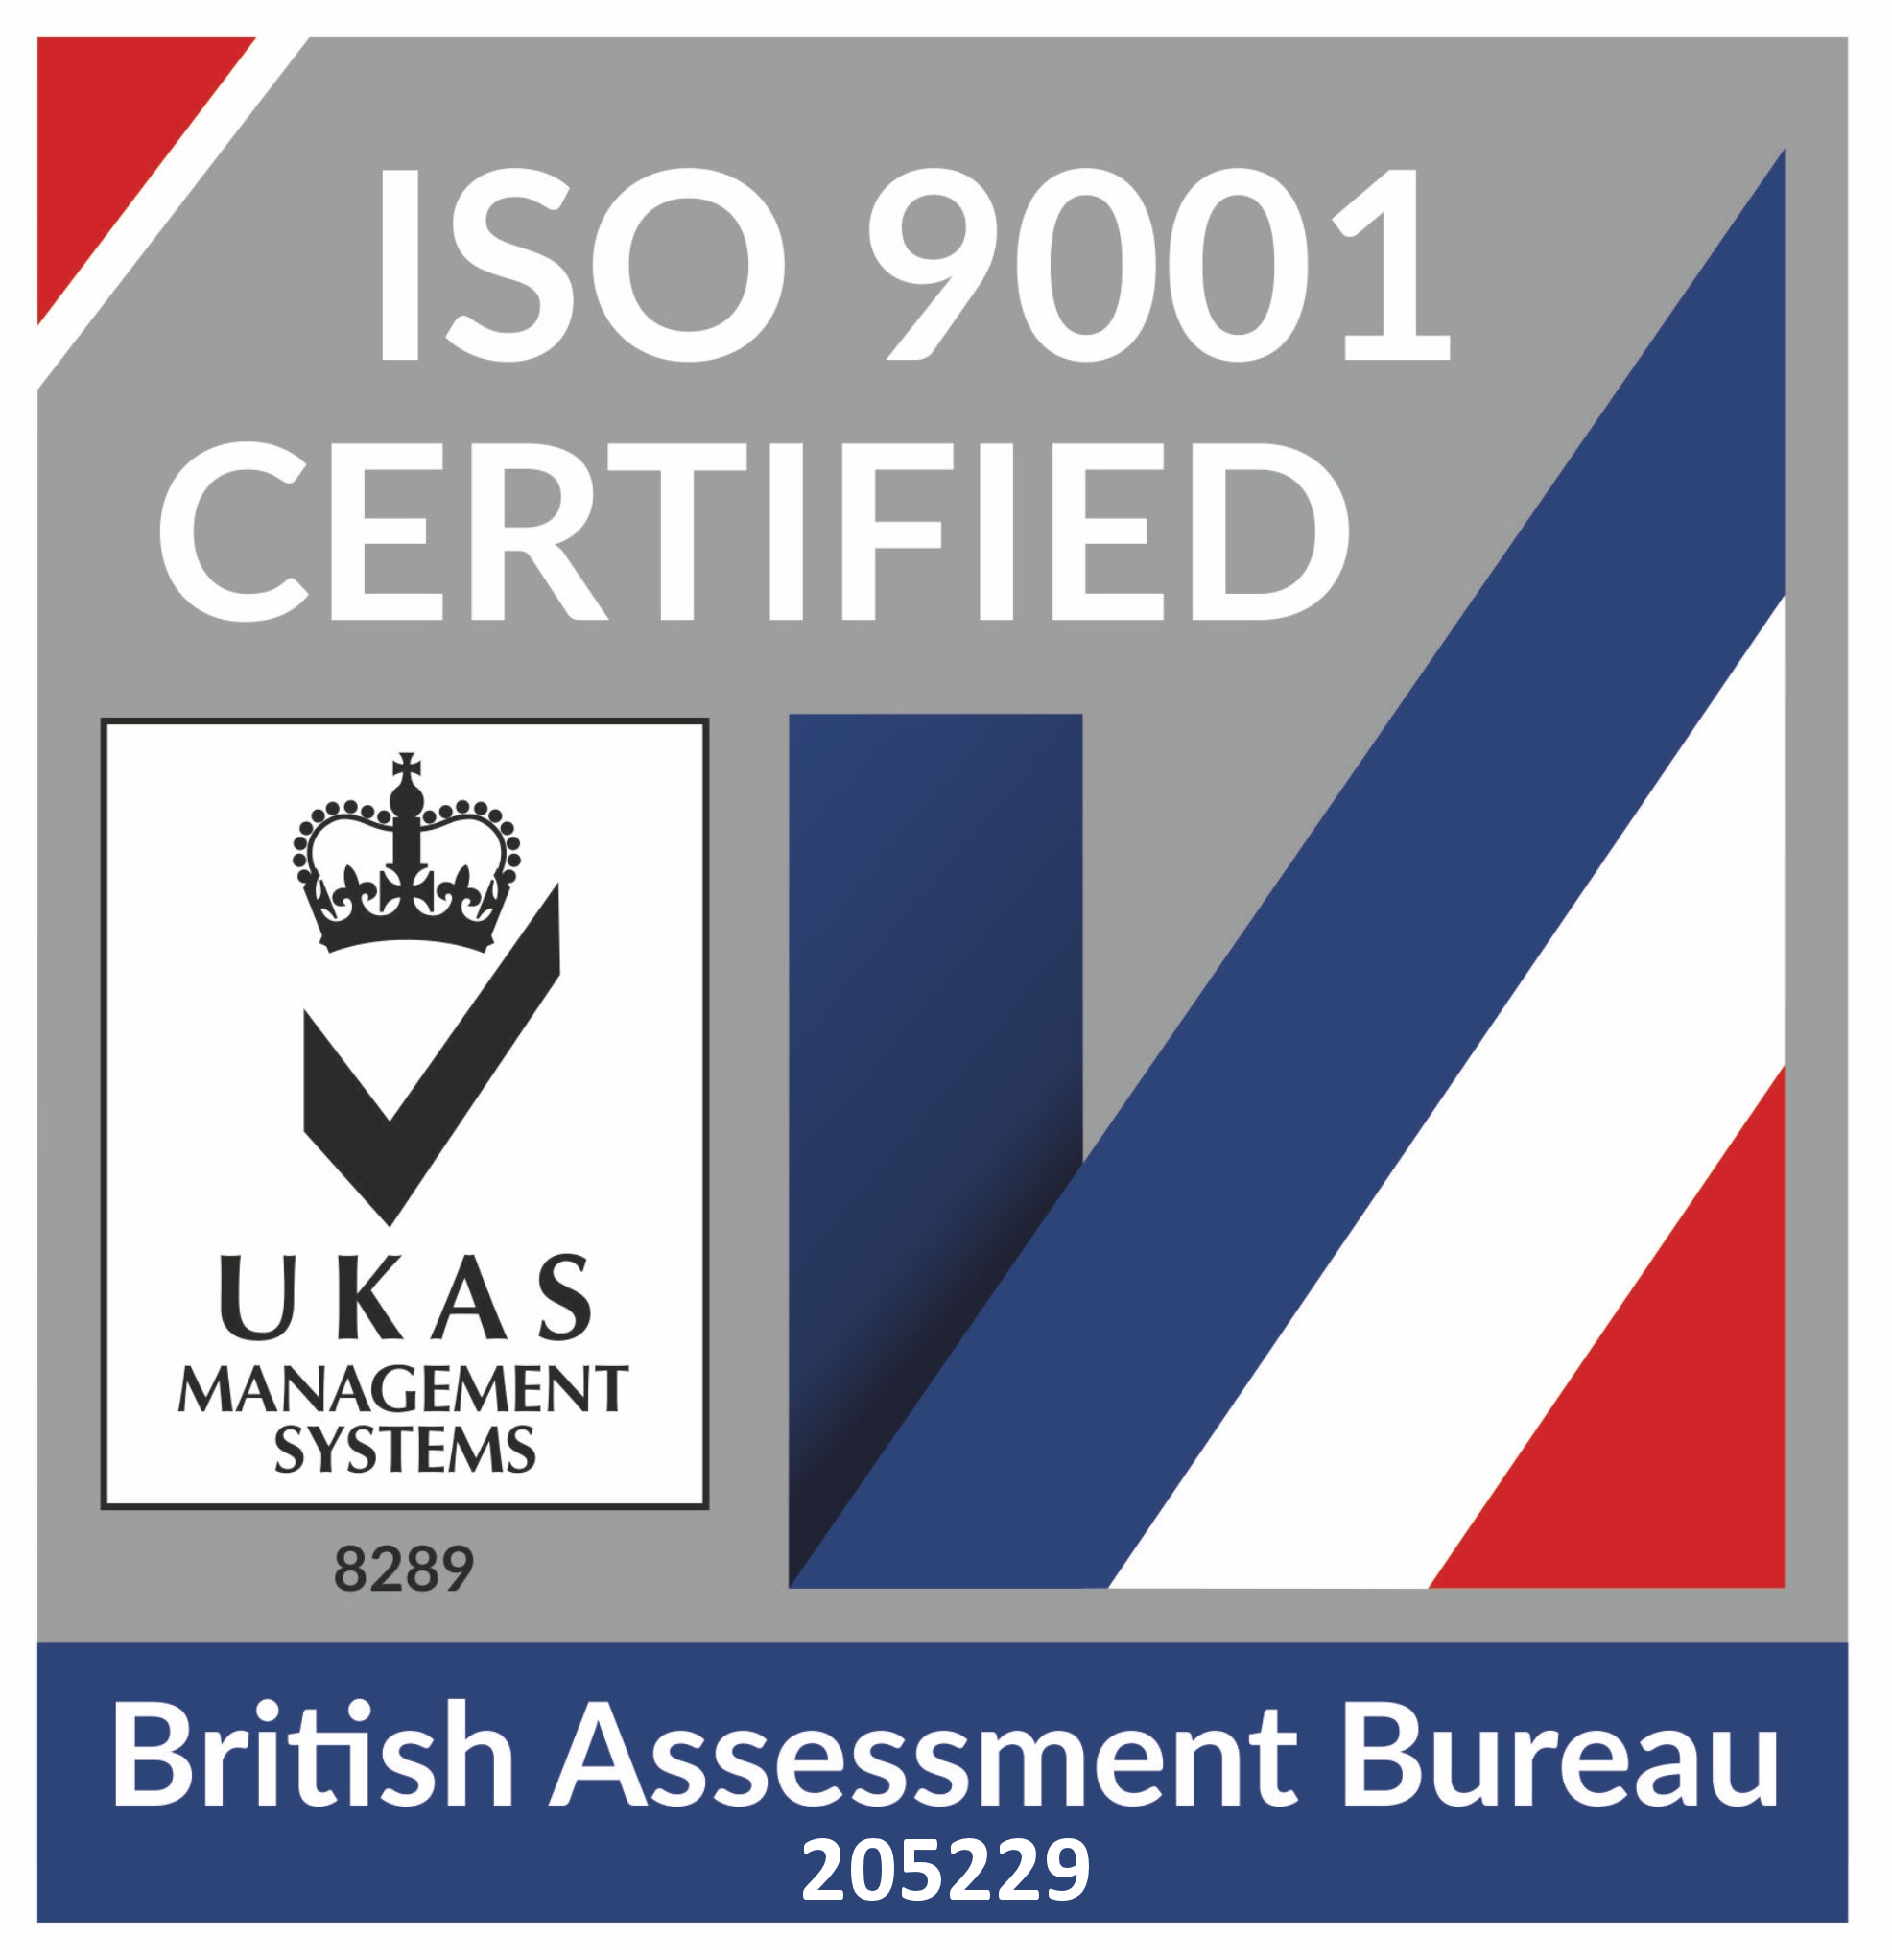 UKCAS ISO 9001